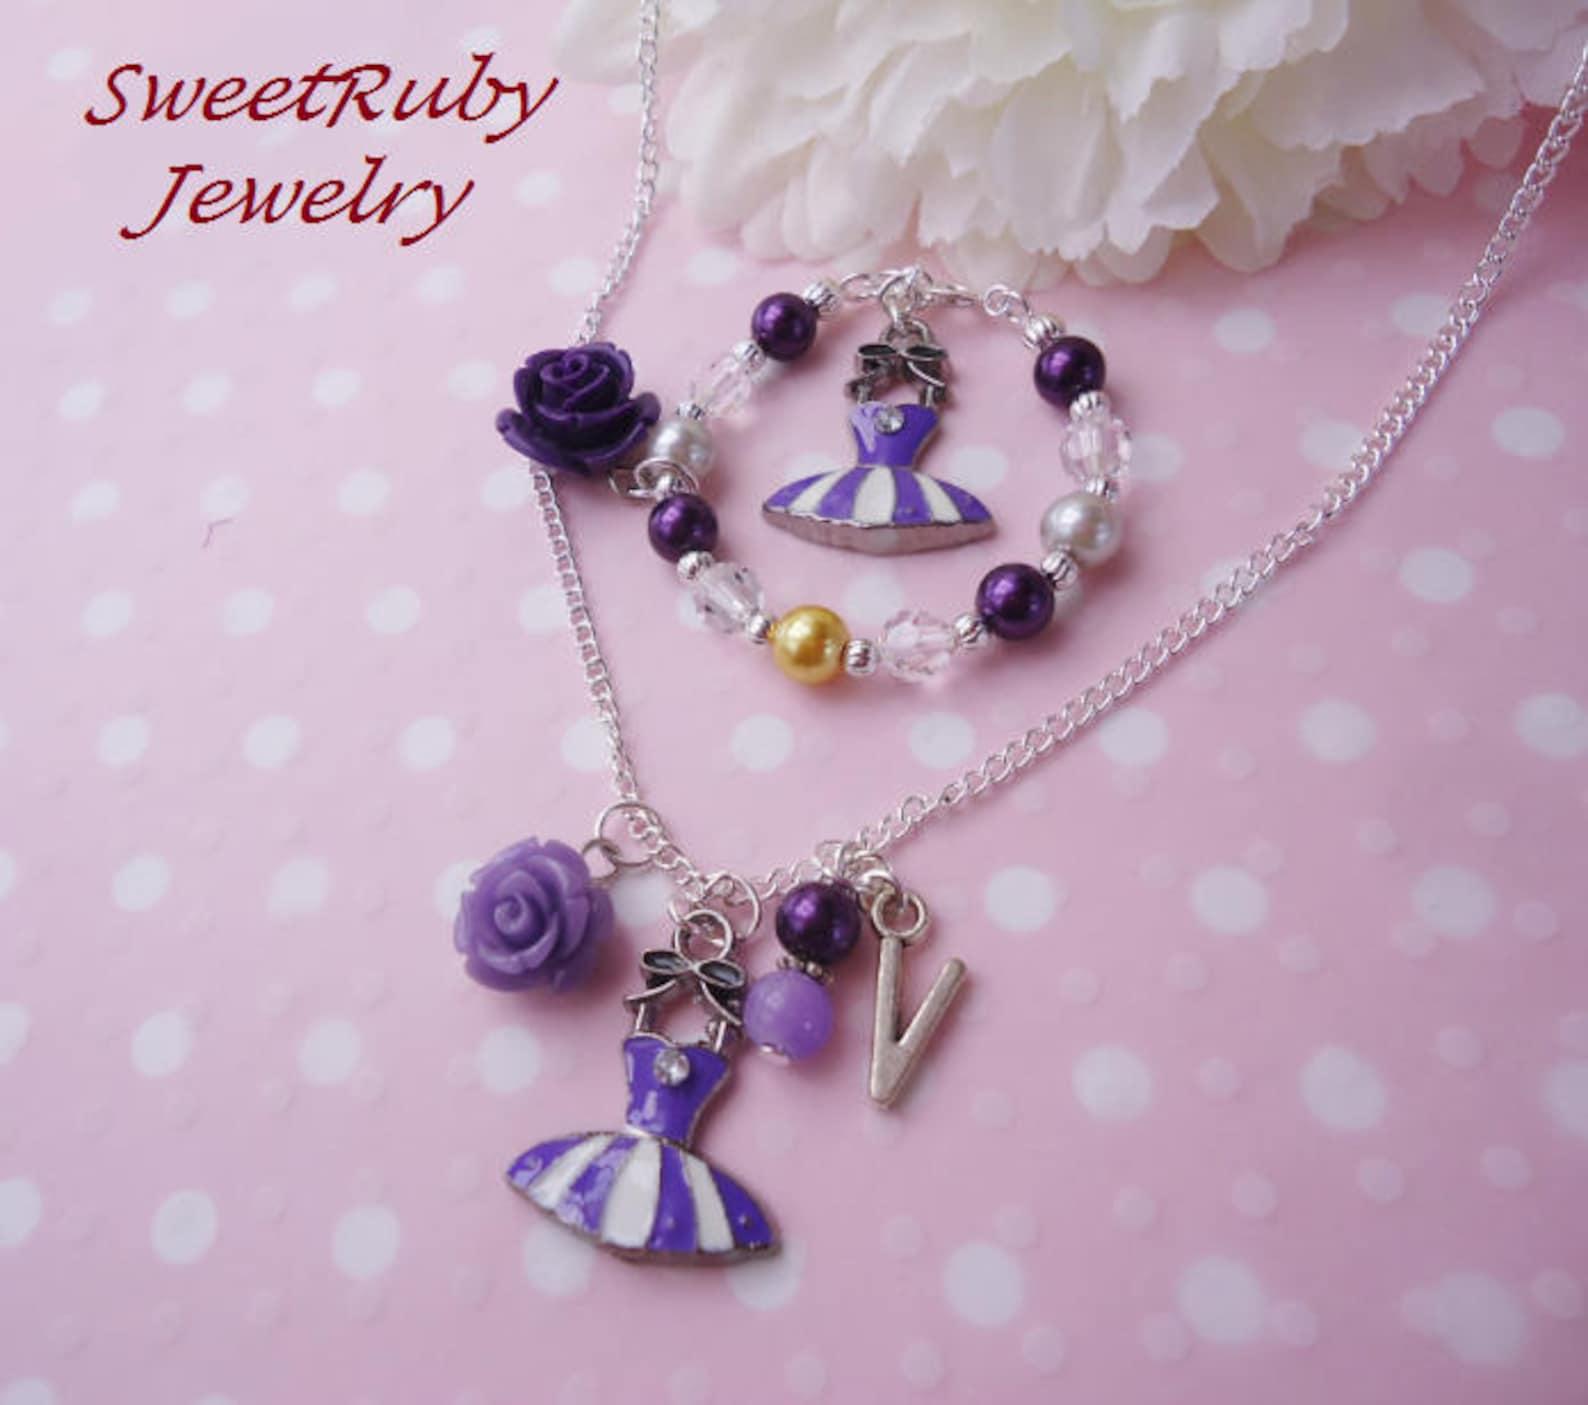 initial dance/ballet tutu bracelet & chain necklace set - blue, purple, green tutu, yellow shoes - dance performance - w/ a gift